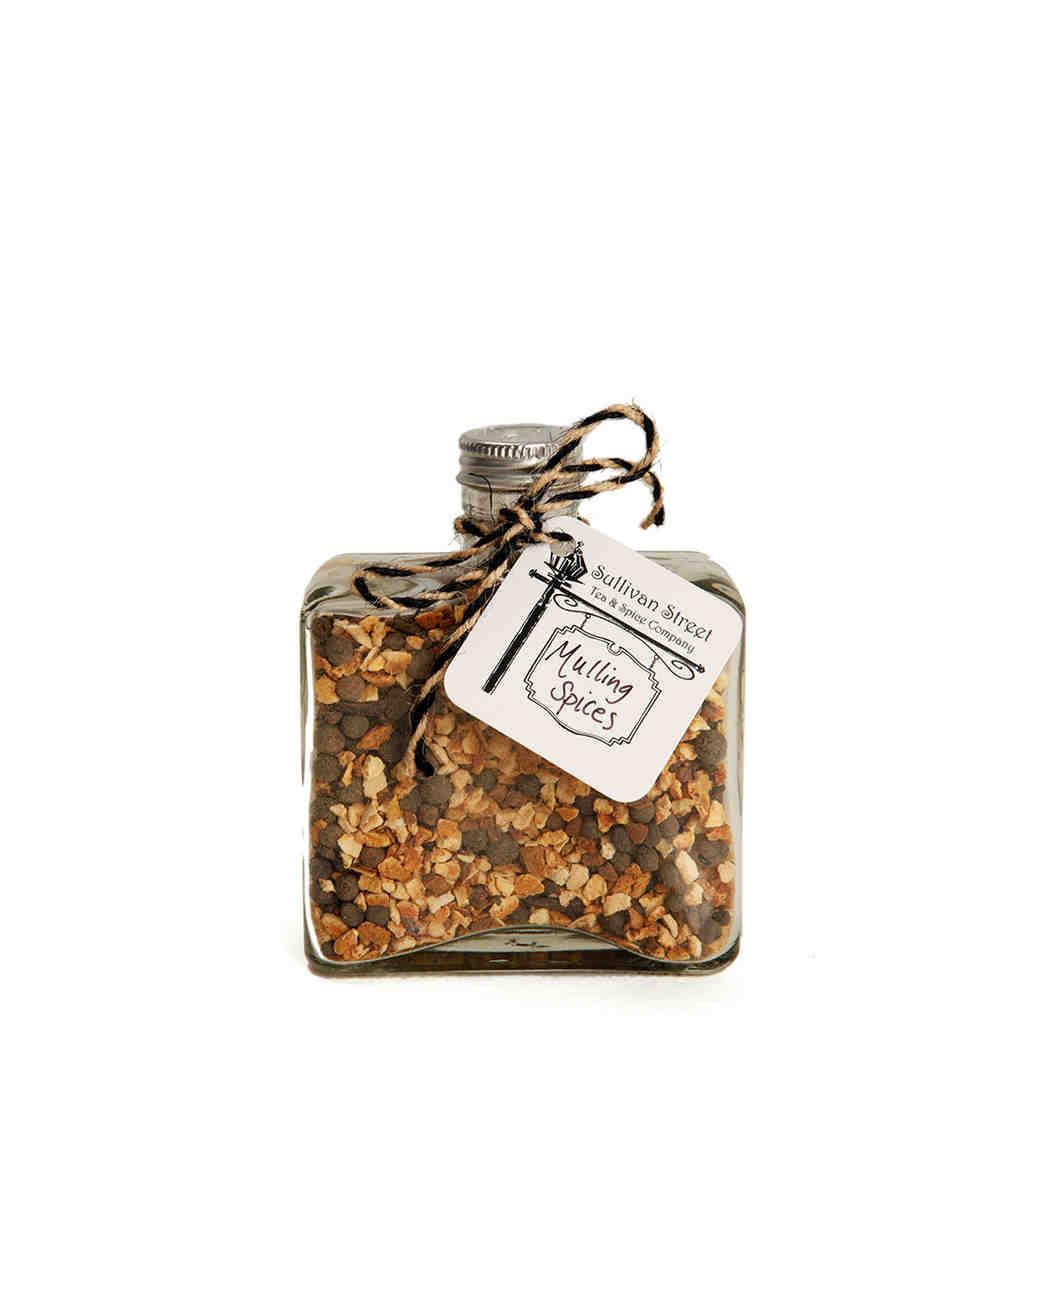 sullivan-street-mulling-spices-0216.jpg